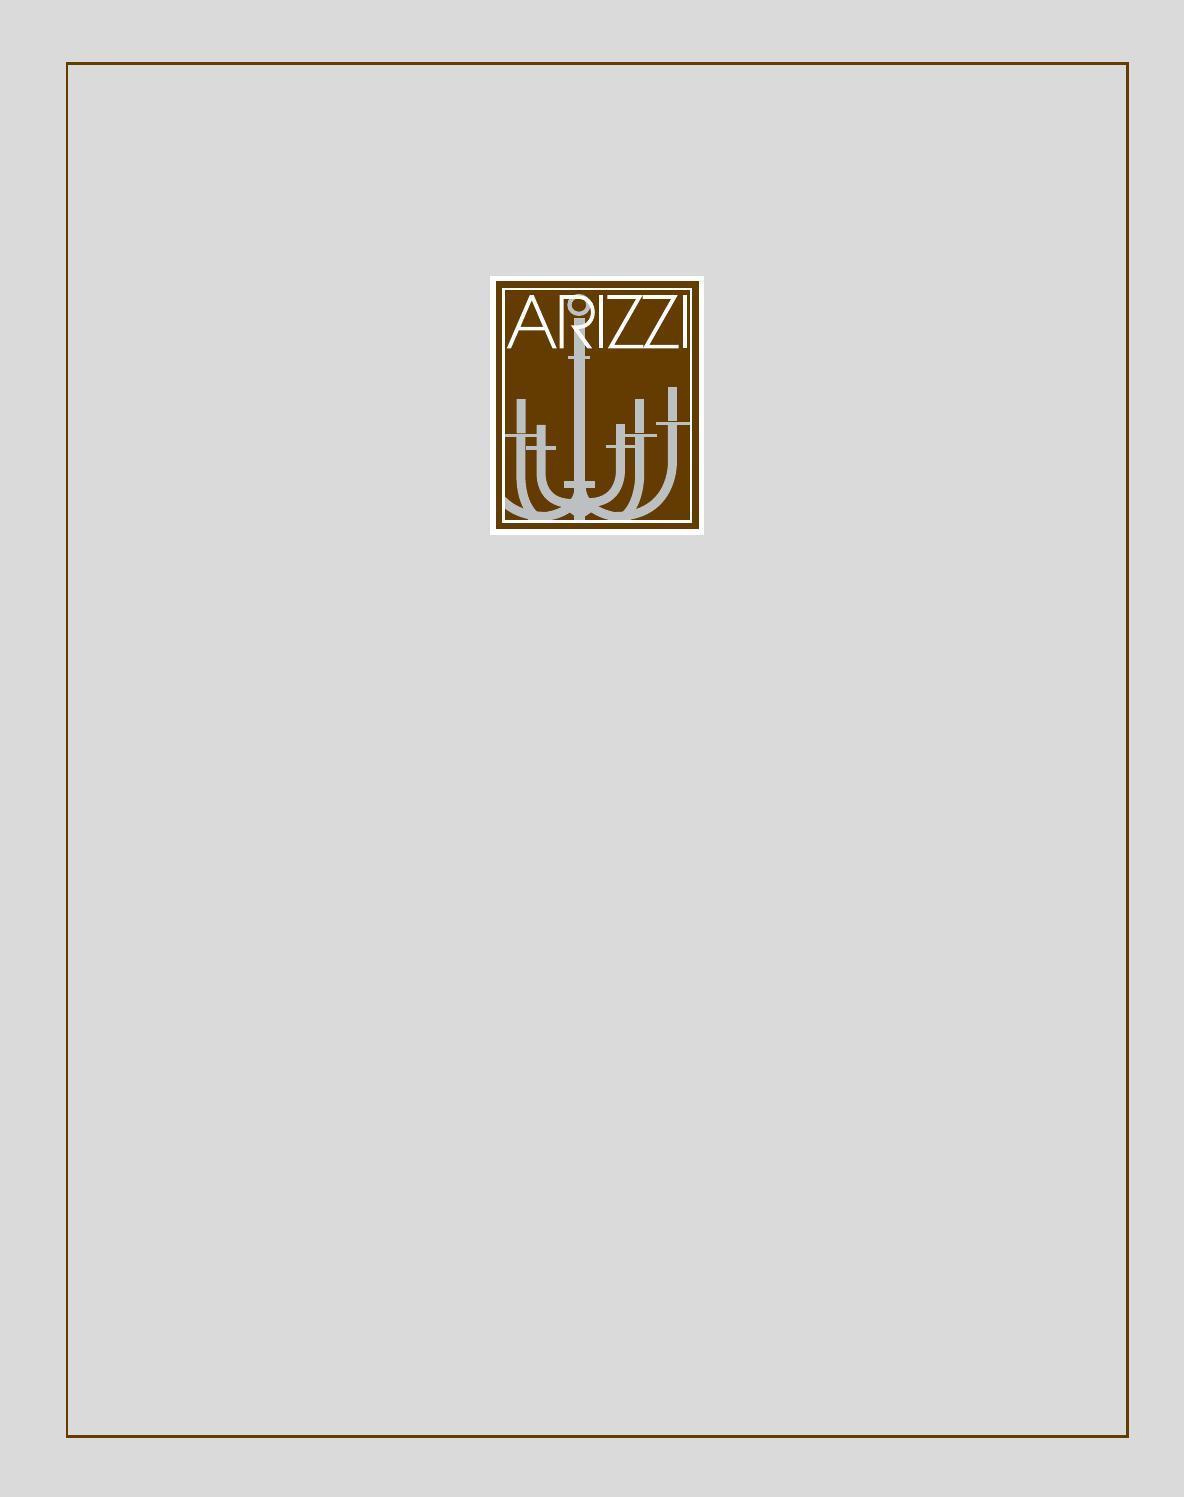 ppt 背景 背景图片 边框 模板 设计 矢量 矢量图 素材 相框 1184_1497